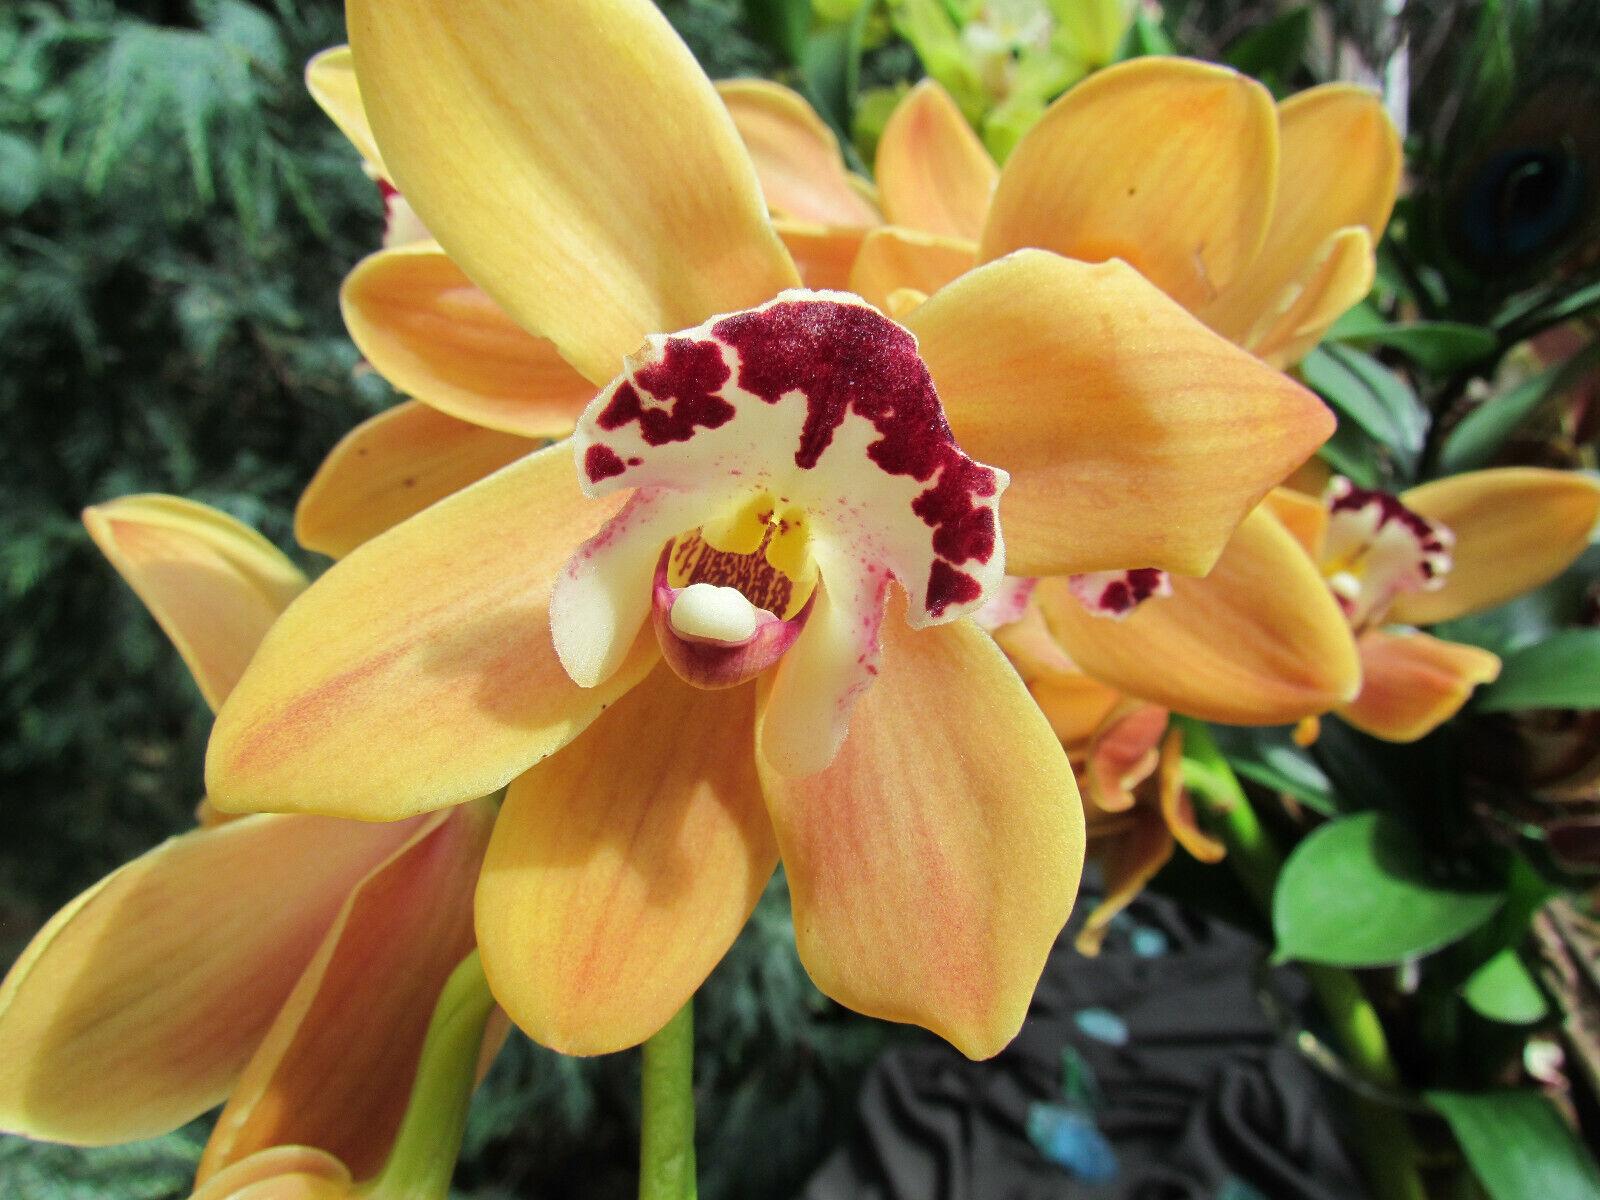 100PCS Orchid Flower Seeds 6 Kinds MIX Color Garden Decor Plant Exotic New